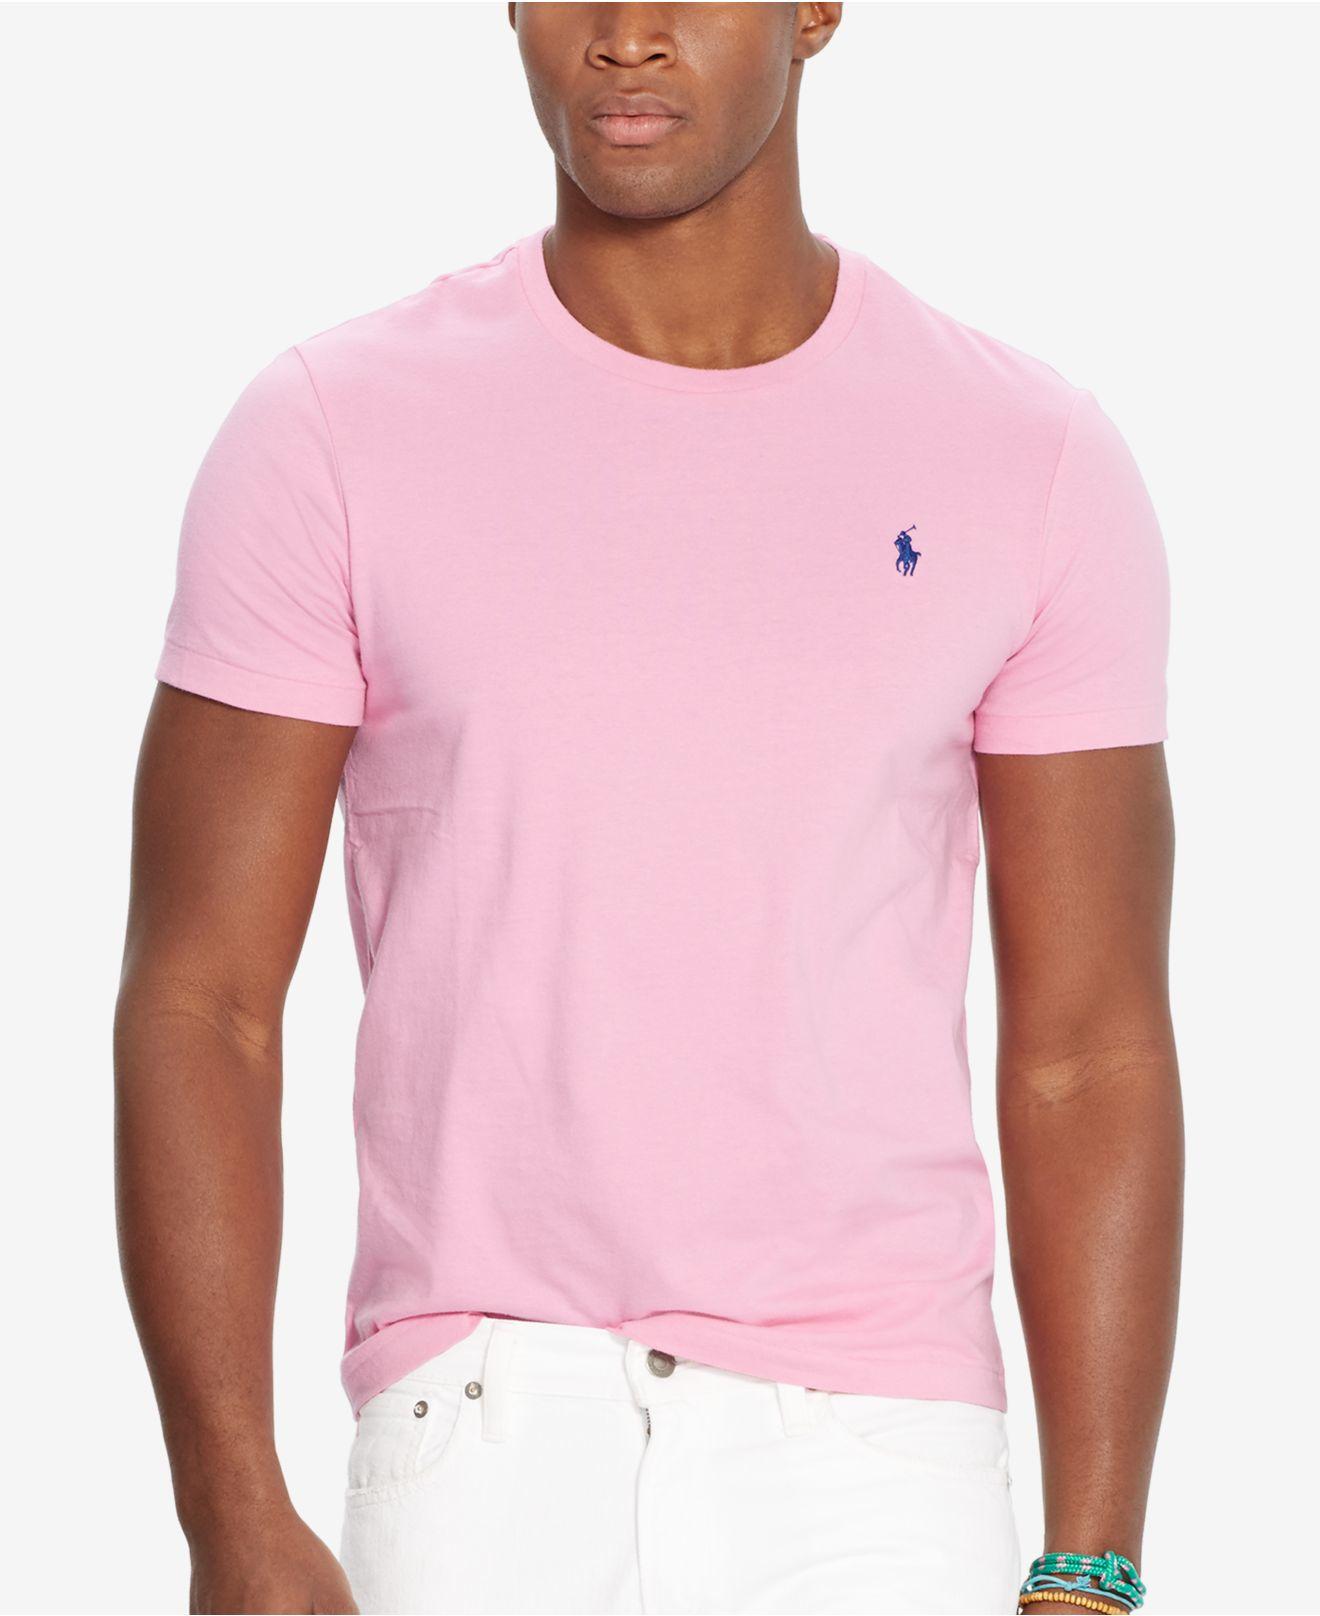 Polo ralph lauren custom fit crew neck t shirt in pink for for Polo custom fit t shirts